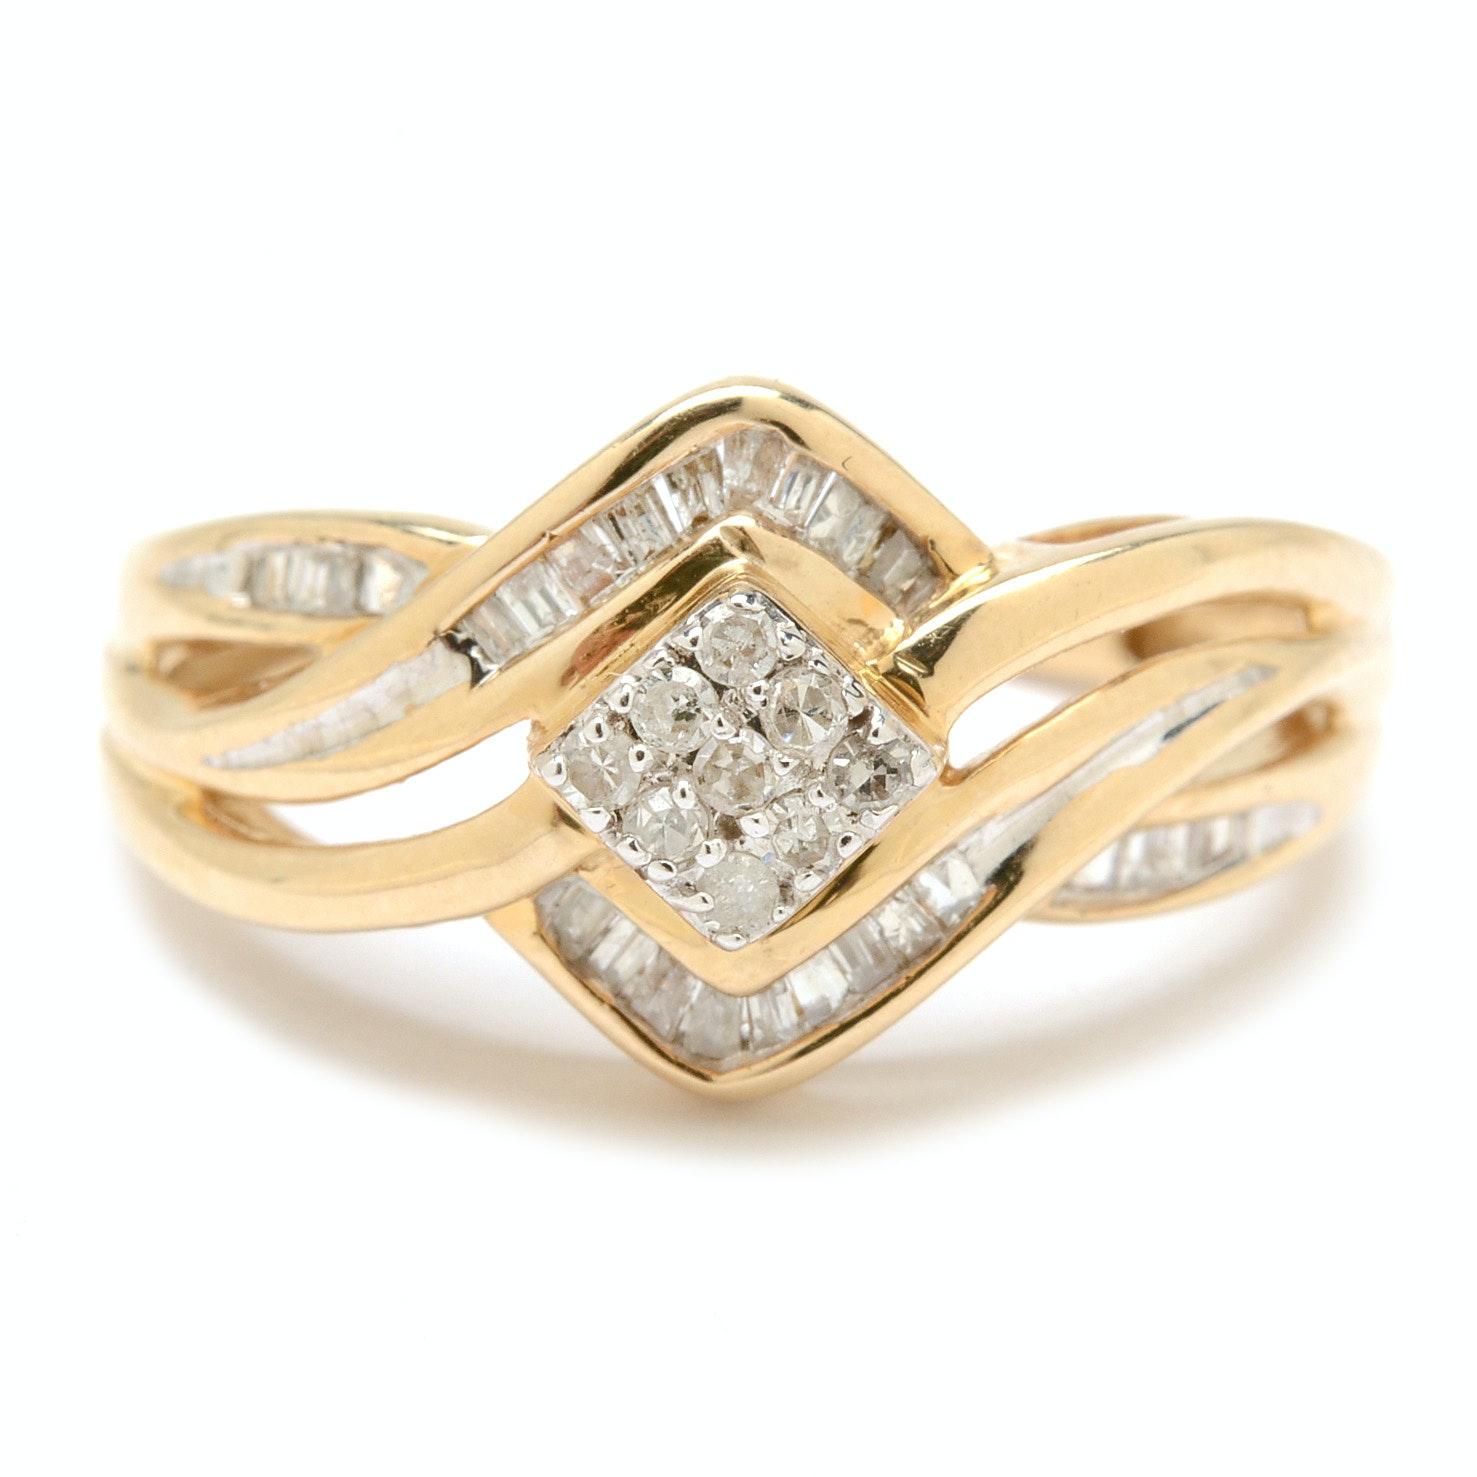 10K Yellow Gold Diamond Cluster Fashion Ring